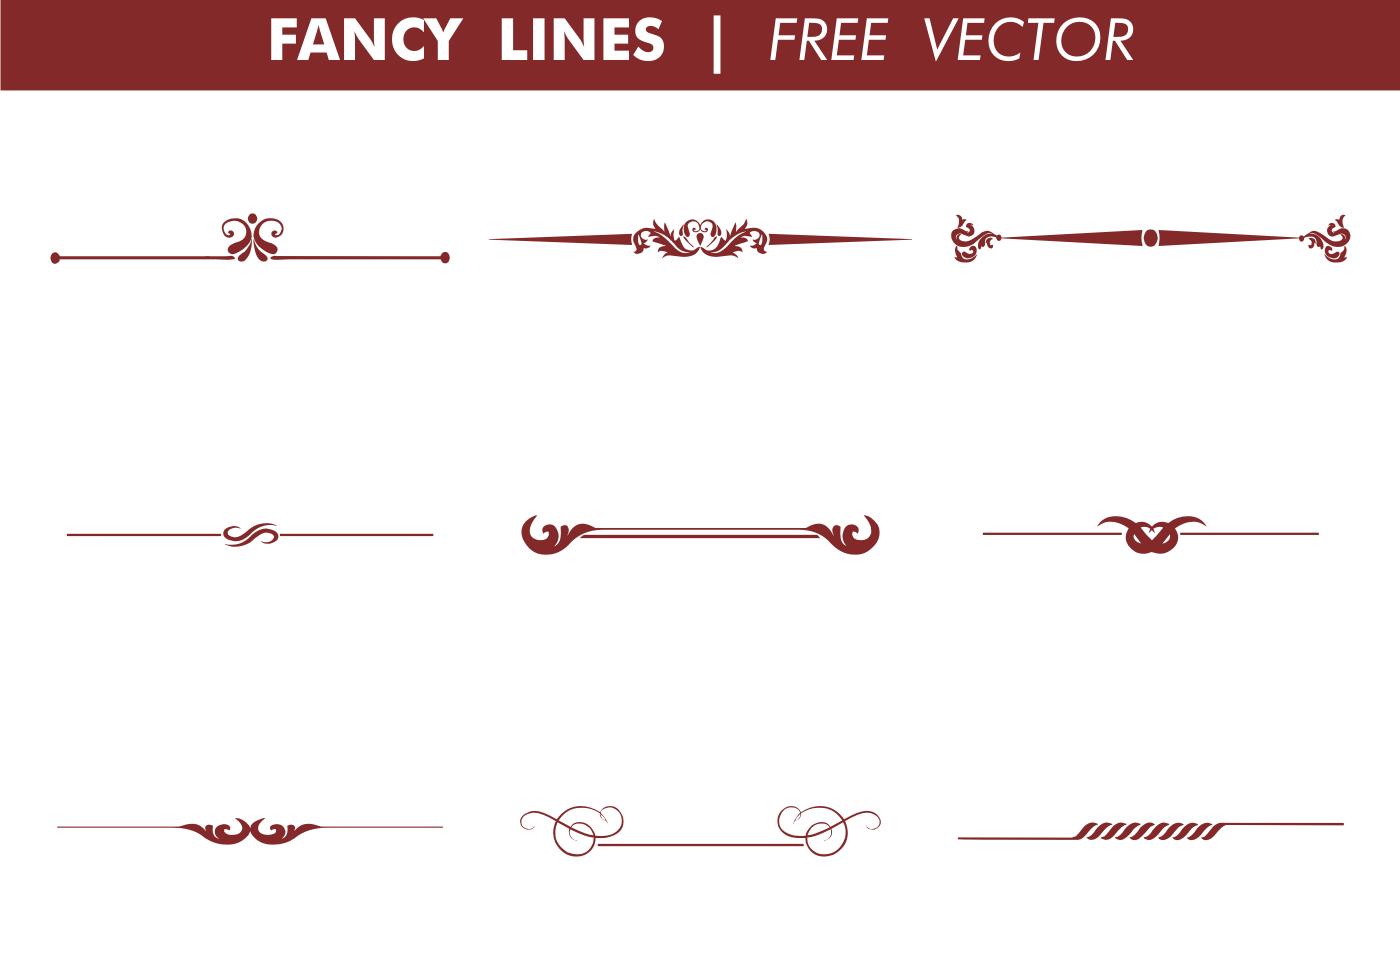 1400x980 Decorative Fancy Lines Vector